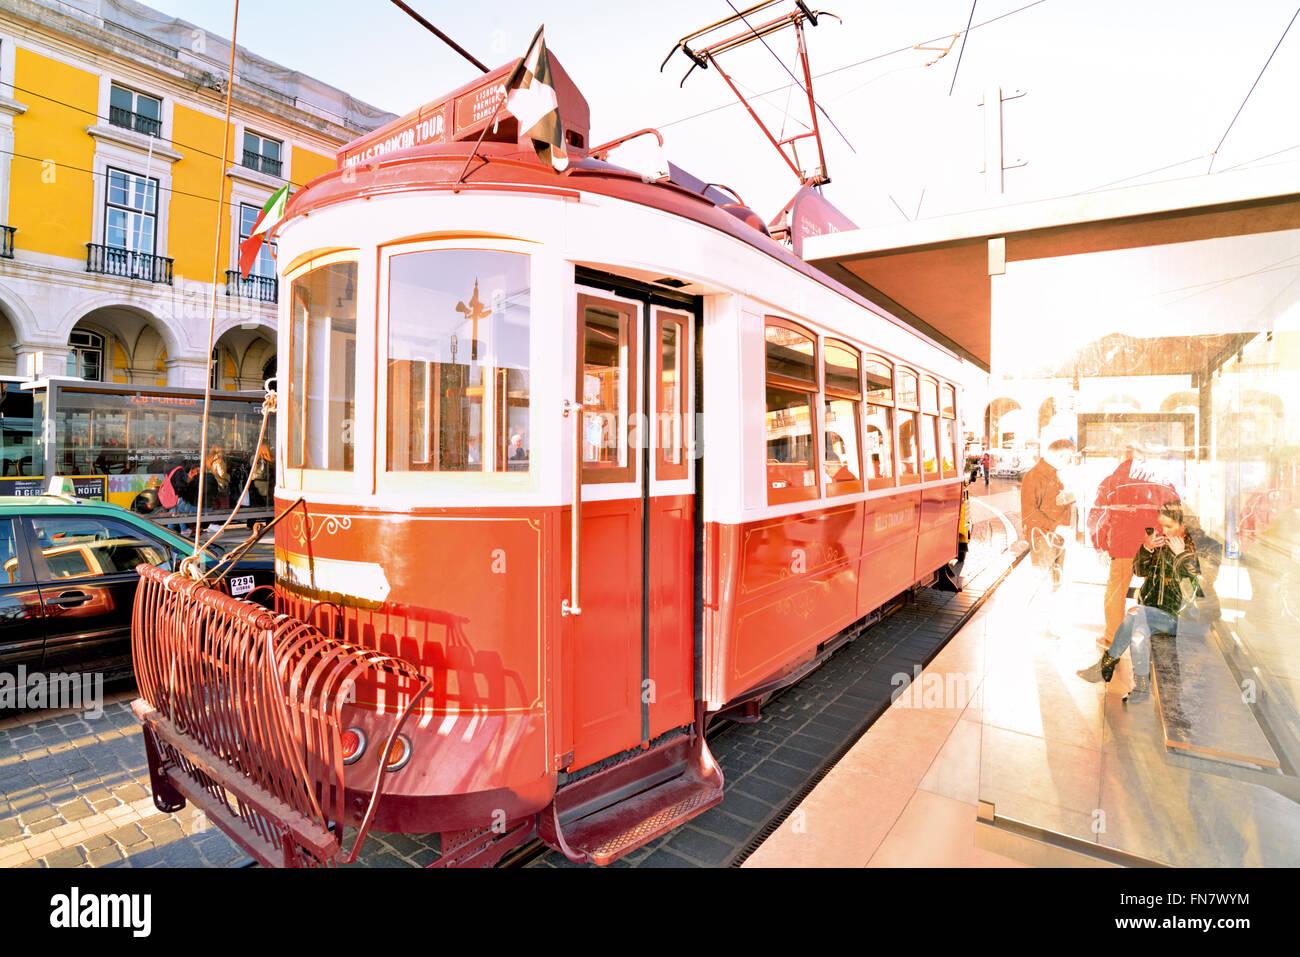 Portugal, Lissabon: Historische rote Straßenbahn Haltestelle Praca do Comercio Stockbild